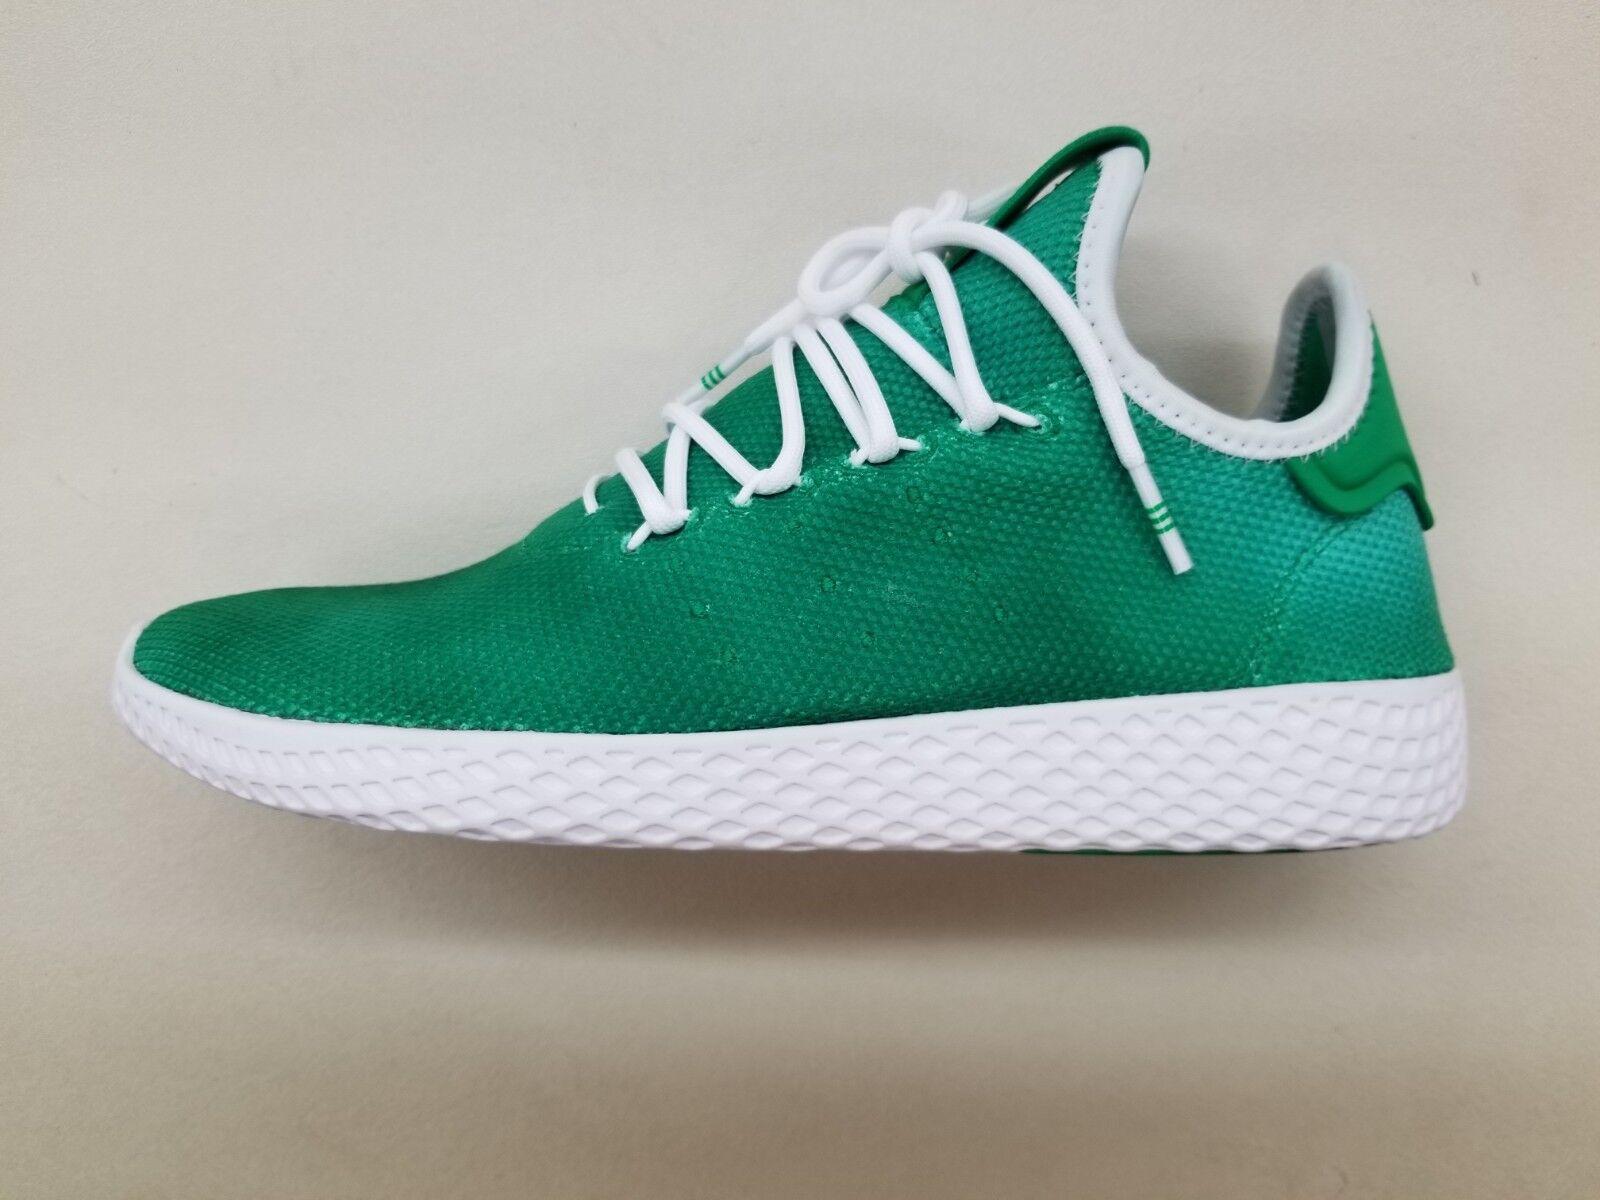 Adidas tye originals pw hu holi tye Adidas dye tennis grün - weiße männer da9619 turnschuhe. b7e40e